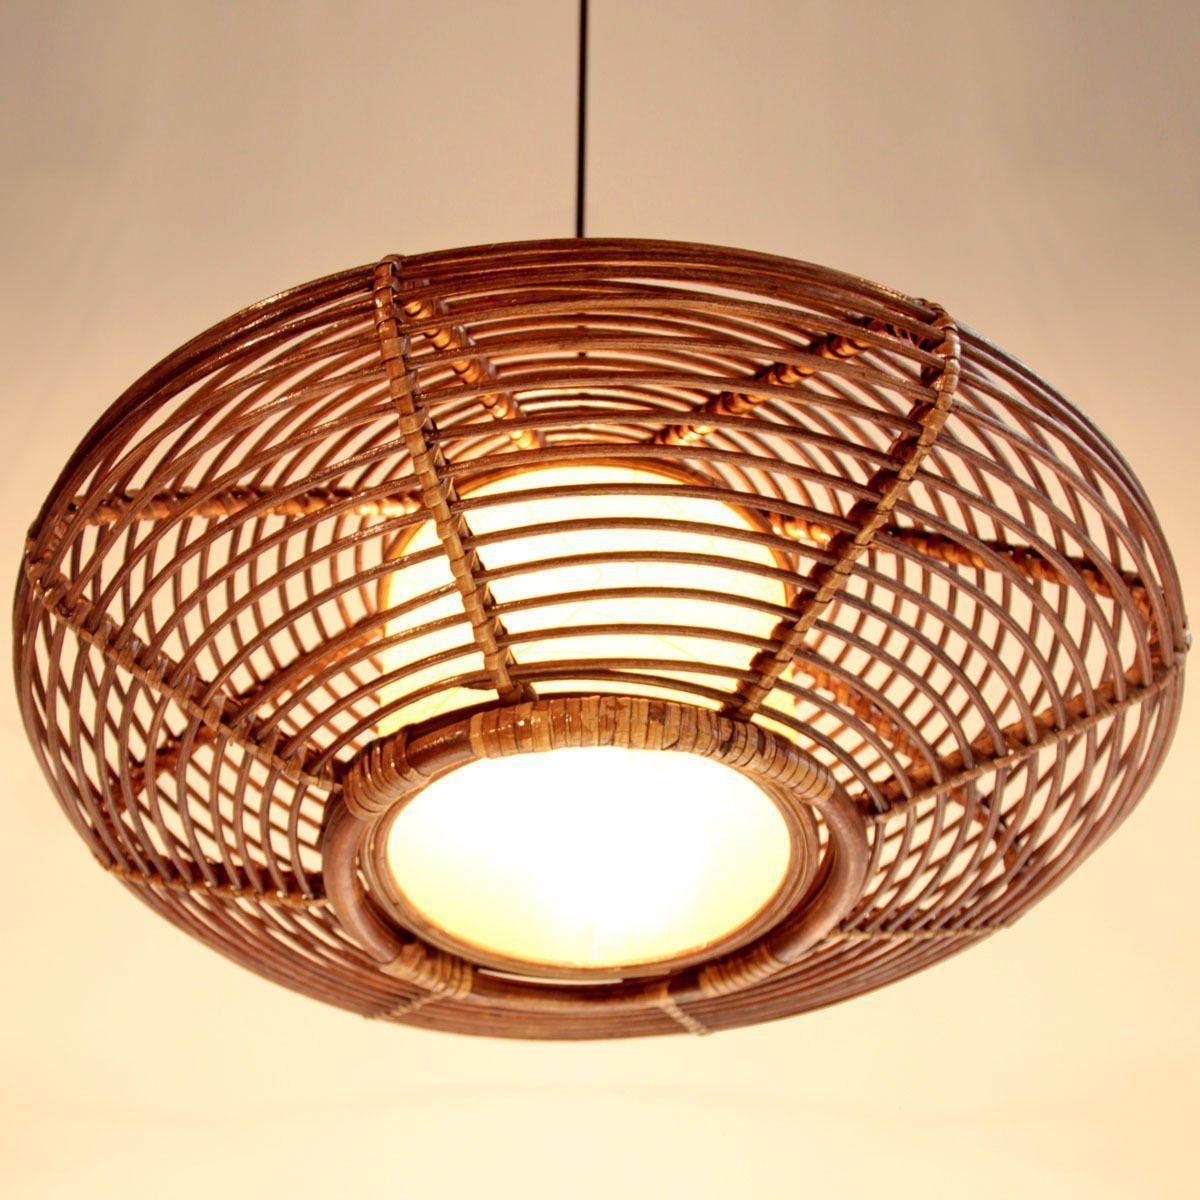 Nilight Handmade Modern Rattan Ceiling Pendant Lamp